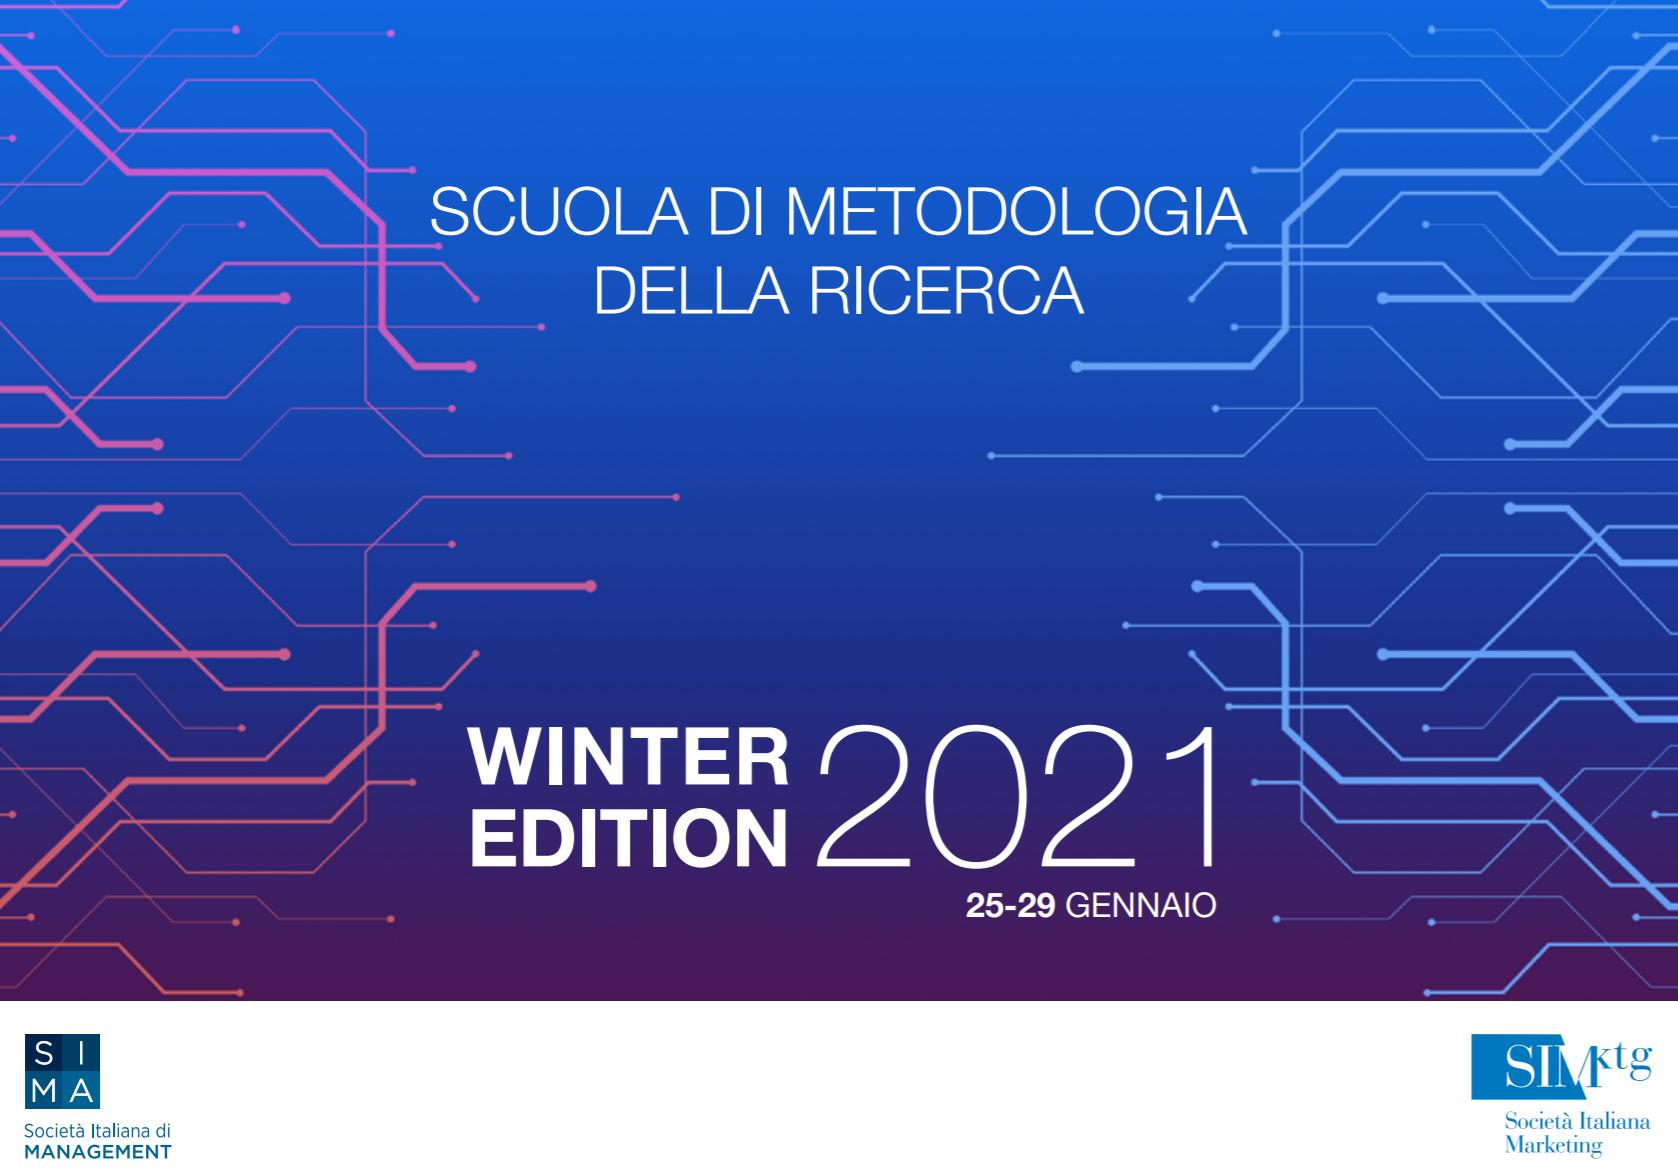 sima-winter-edition-2021